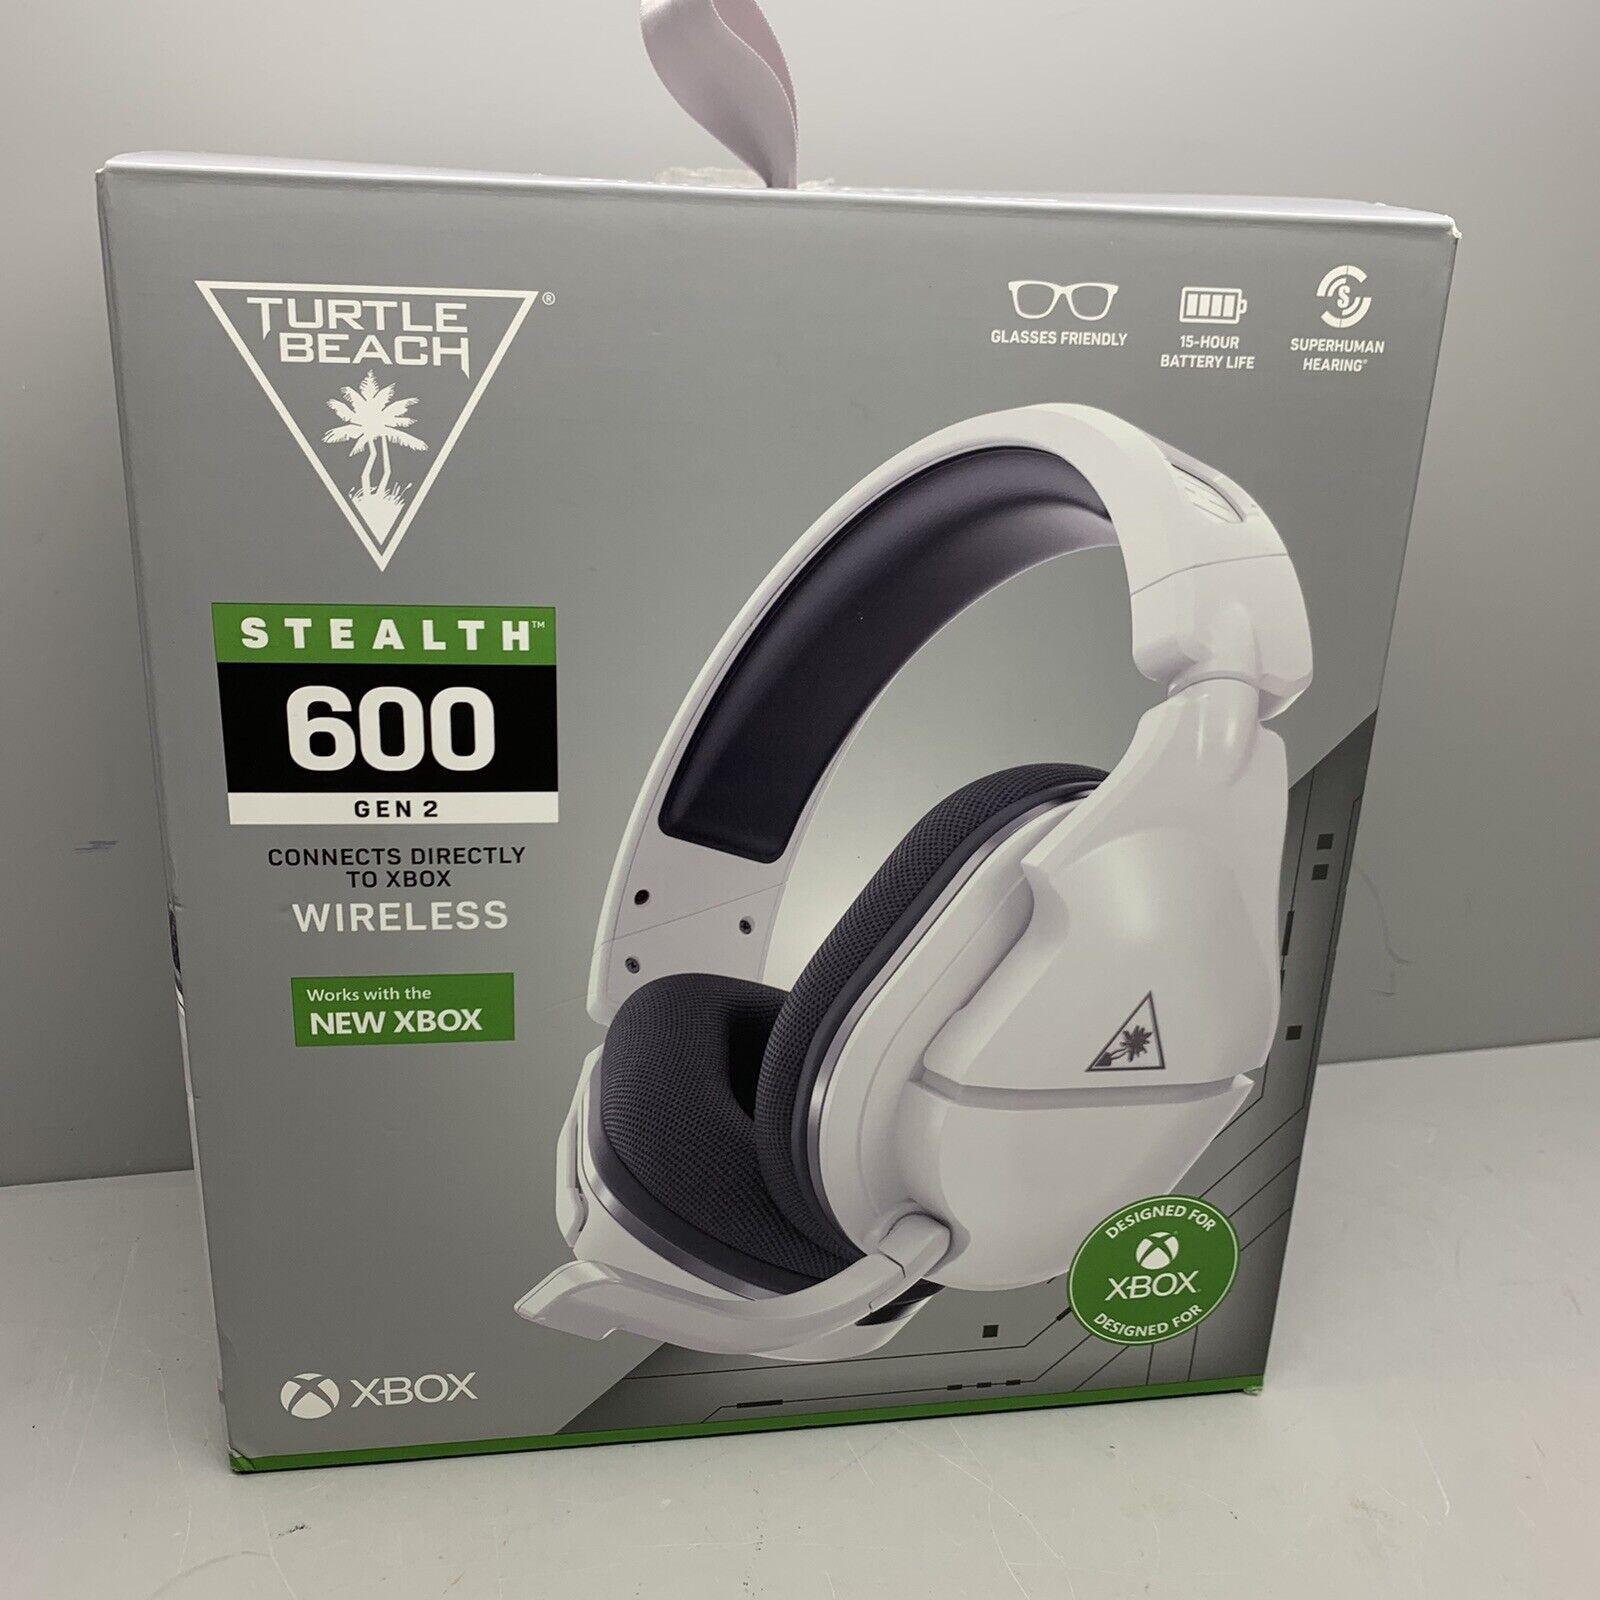 Turtle Beach Stealth 600 Gen 2 Wireless Headset for Xbox One & Xbox Serie...